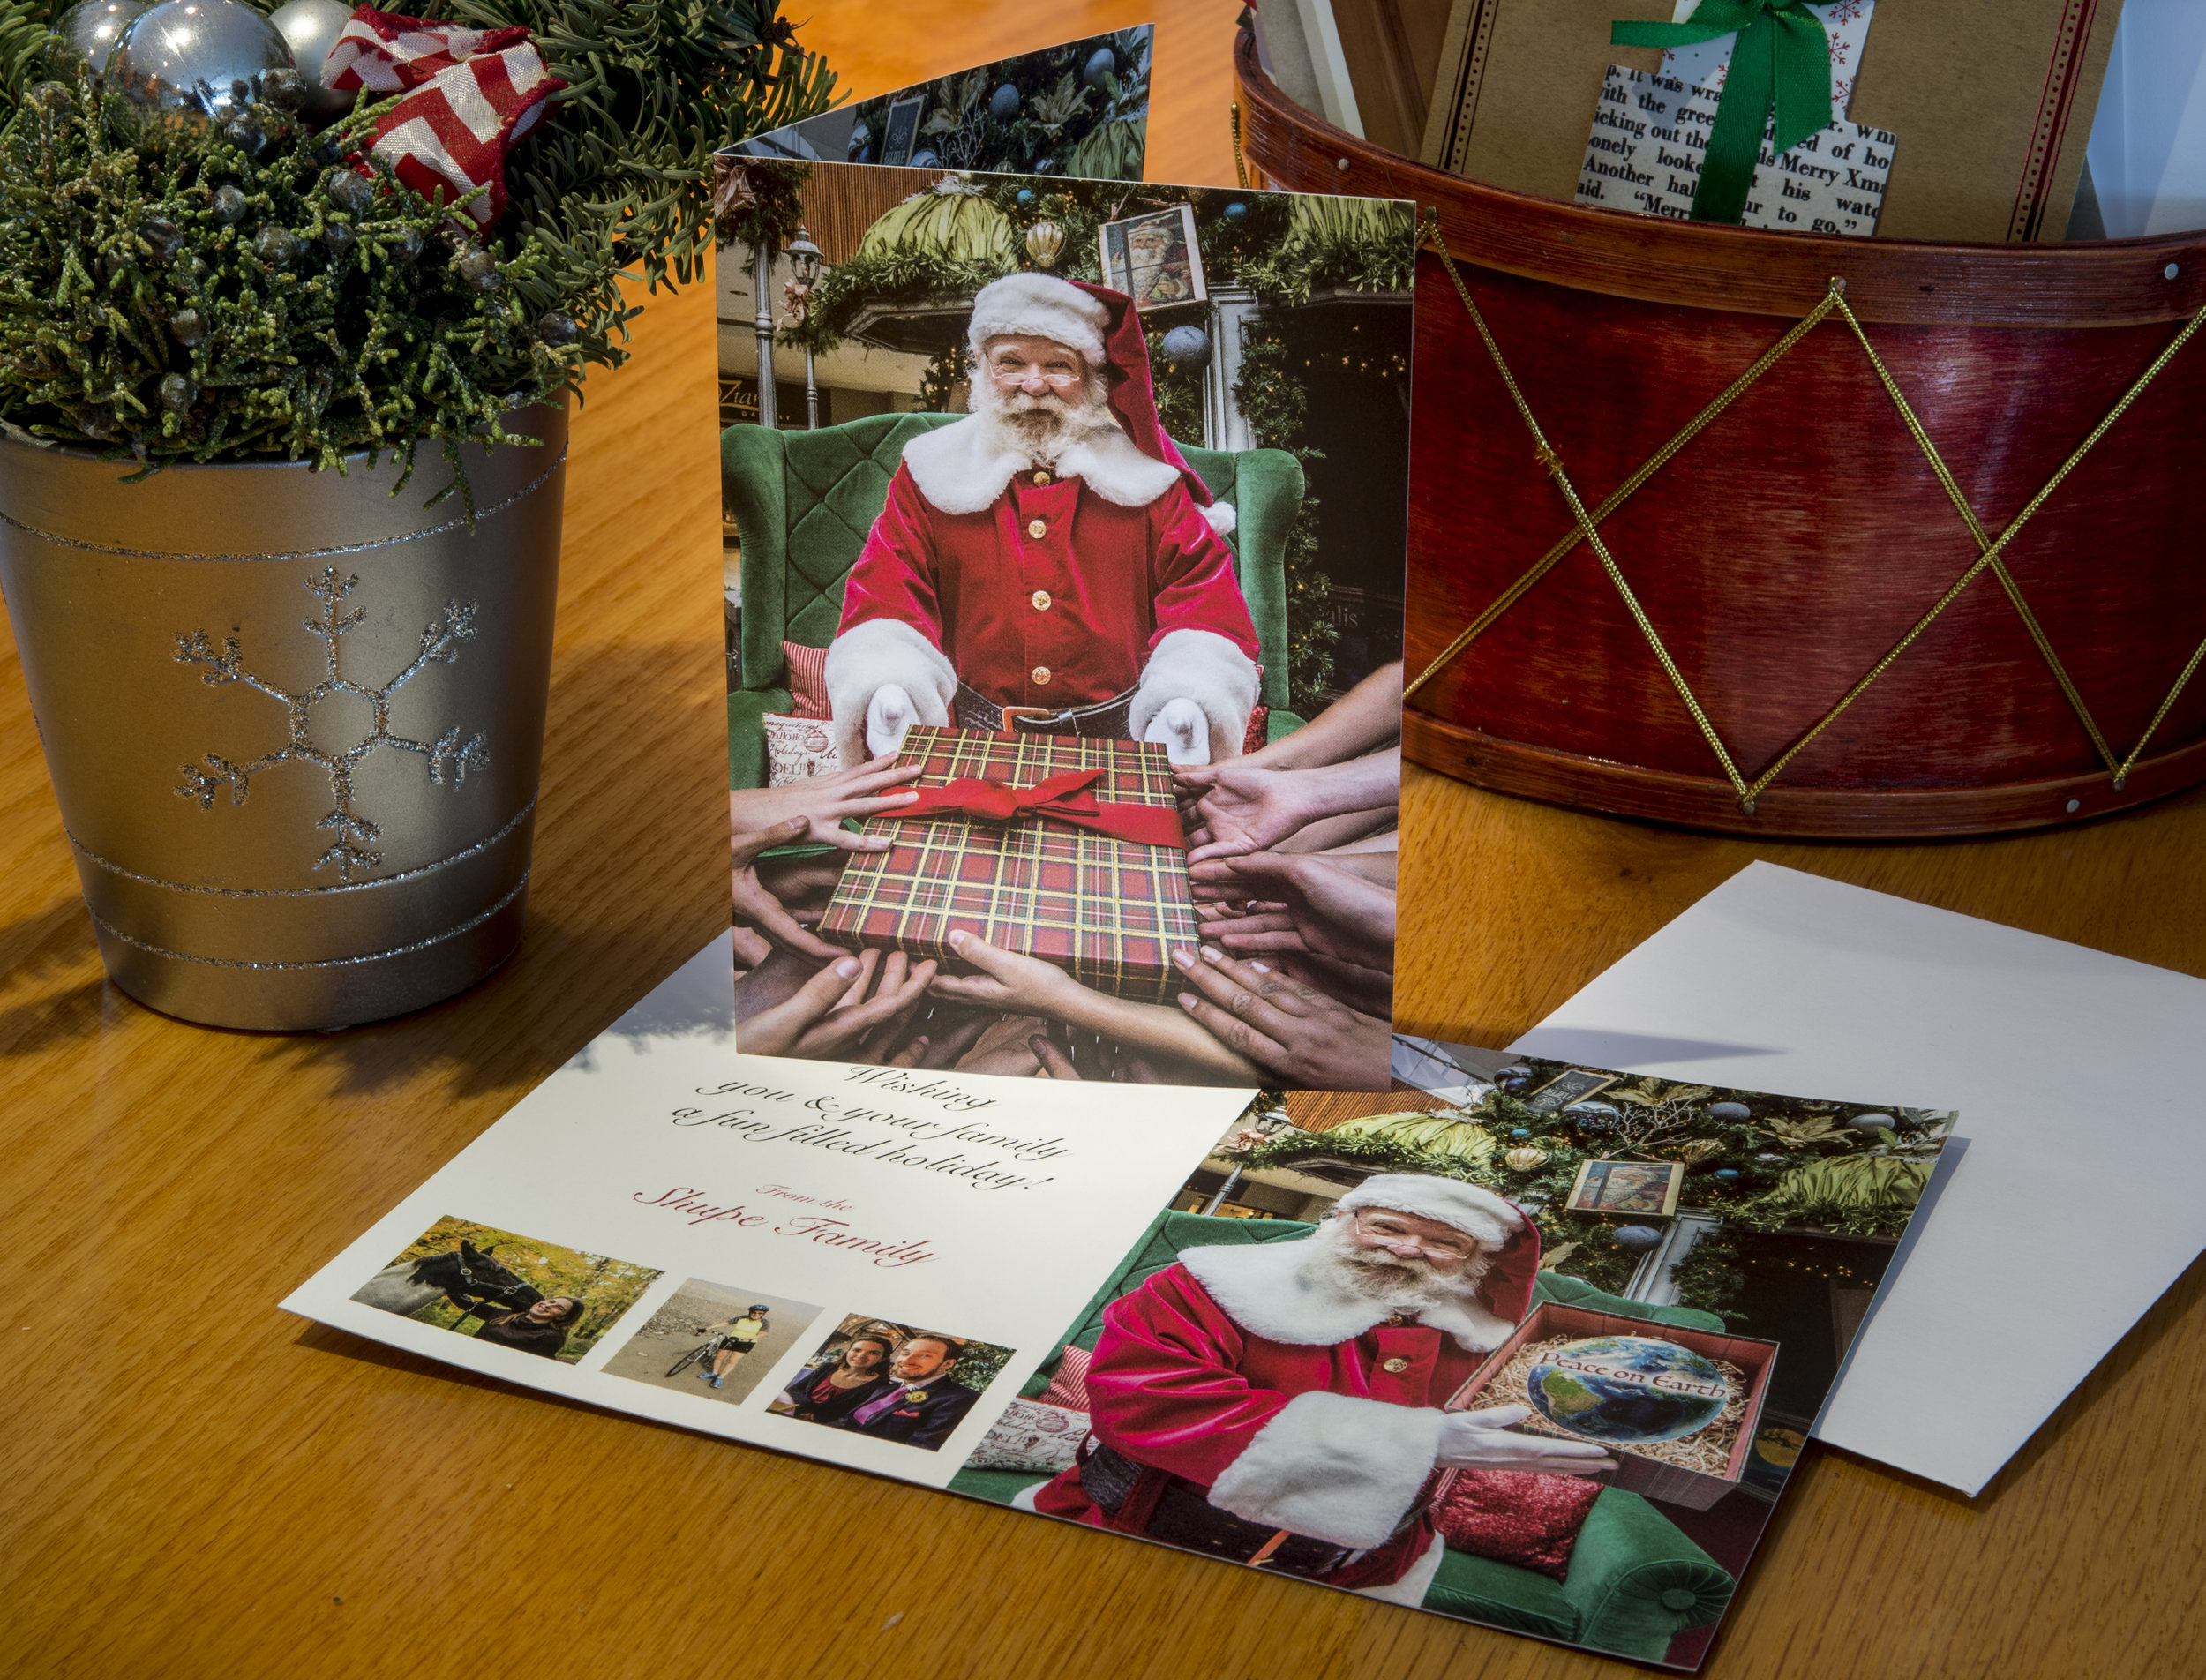 Holiday_Card_2017_display.jpg